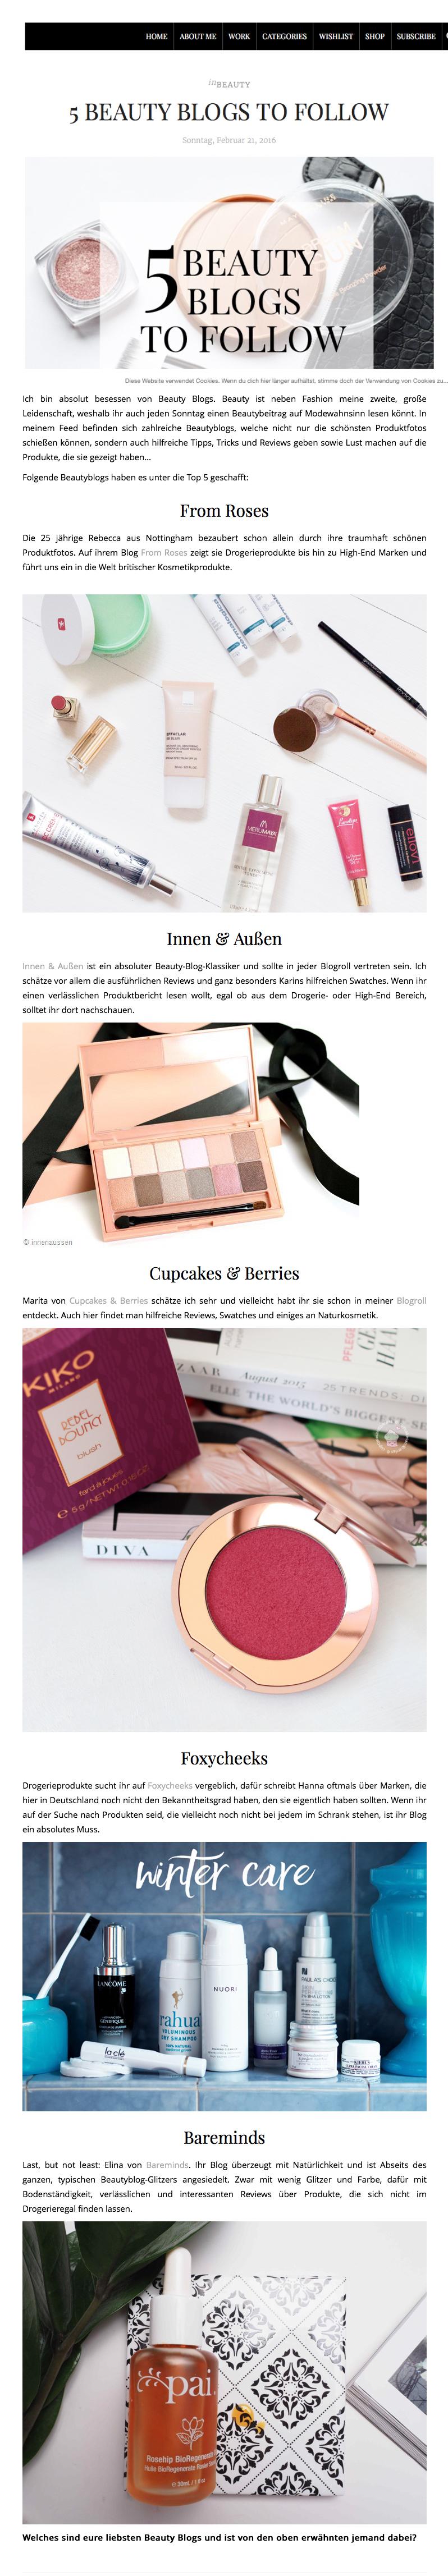 5 Beauty Blogs to Follow